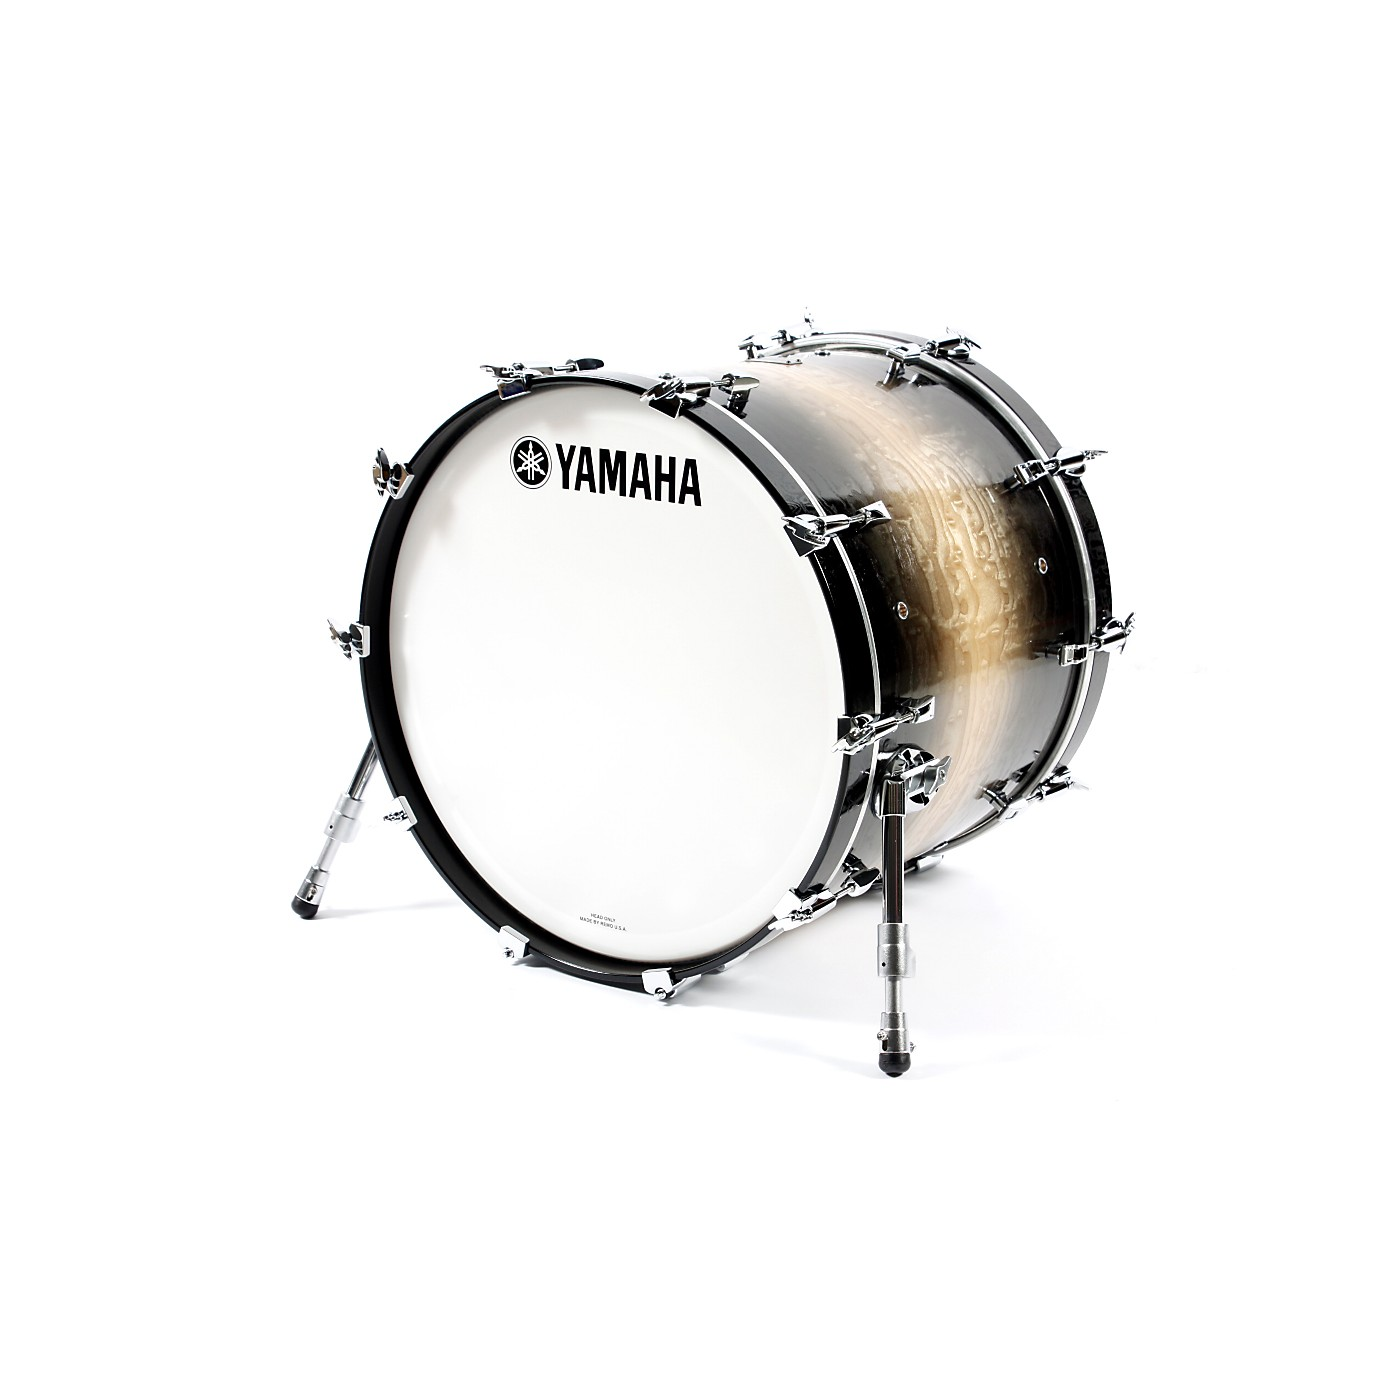 Yamaha Phoenix Bass Drum without Tom Mount thumbnail